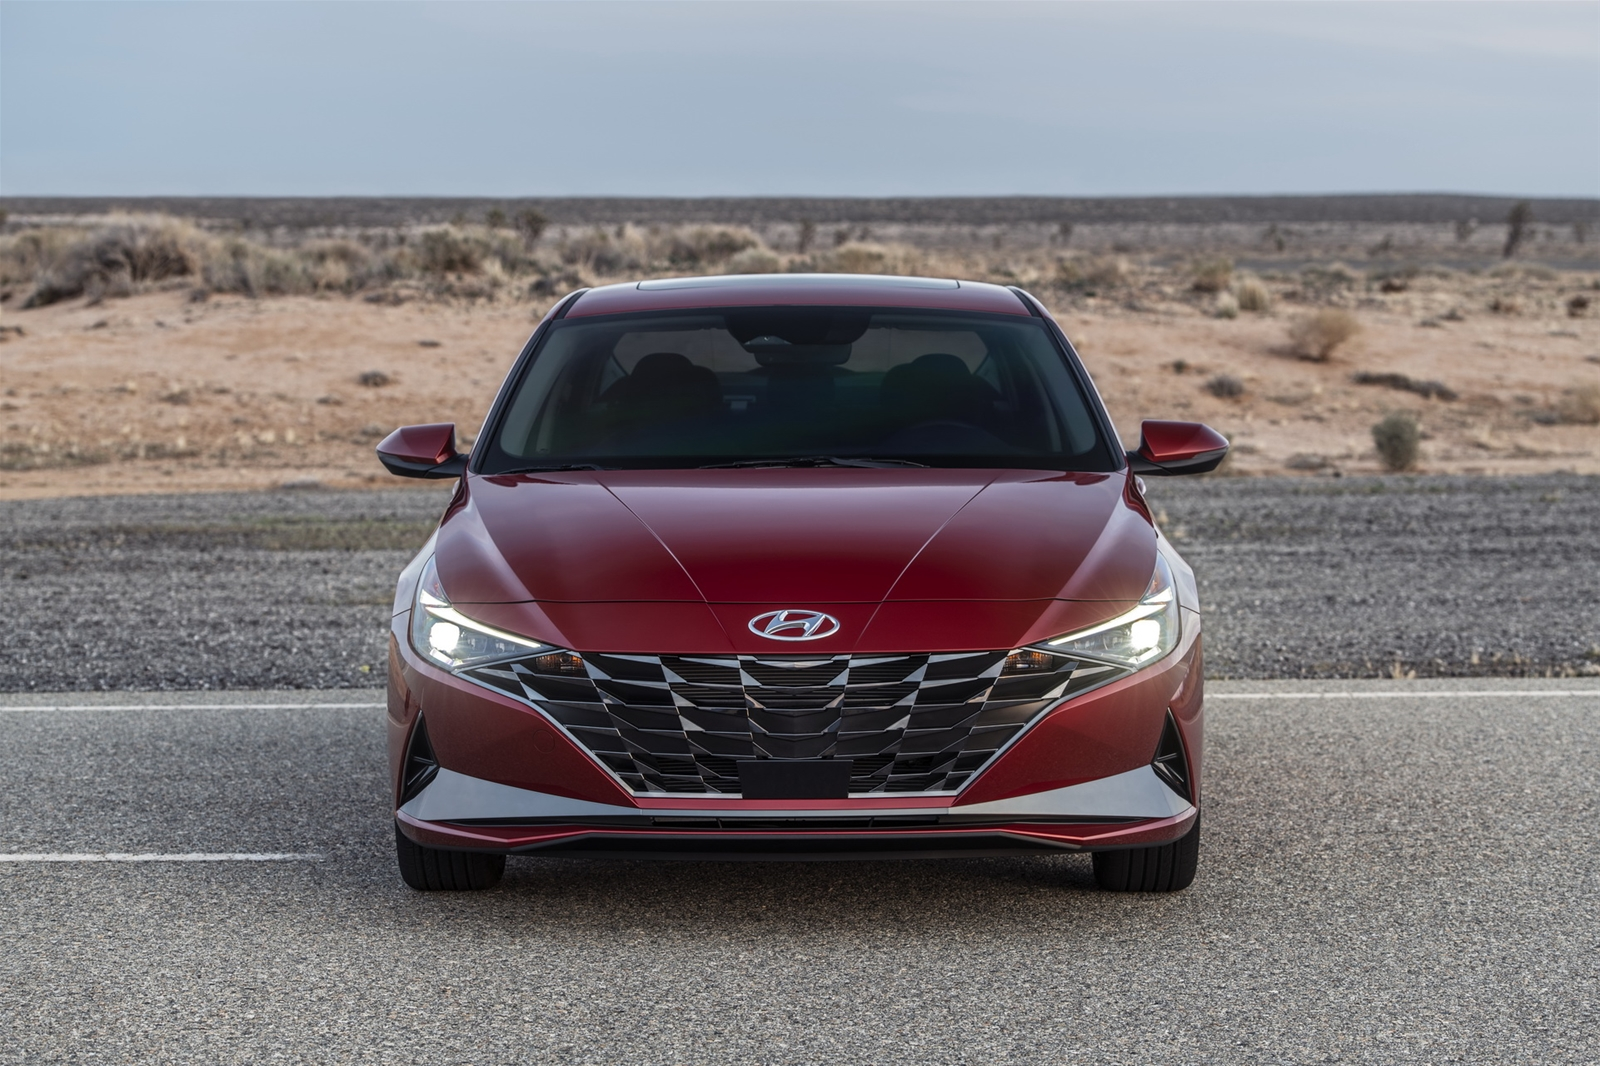 Hyundai Elantra 2021 lột xác